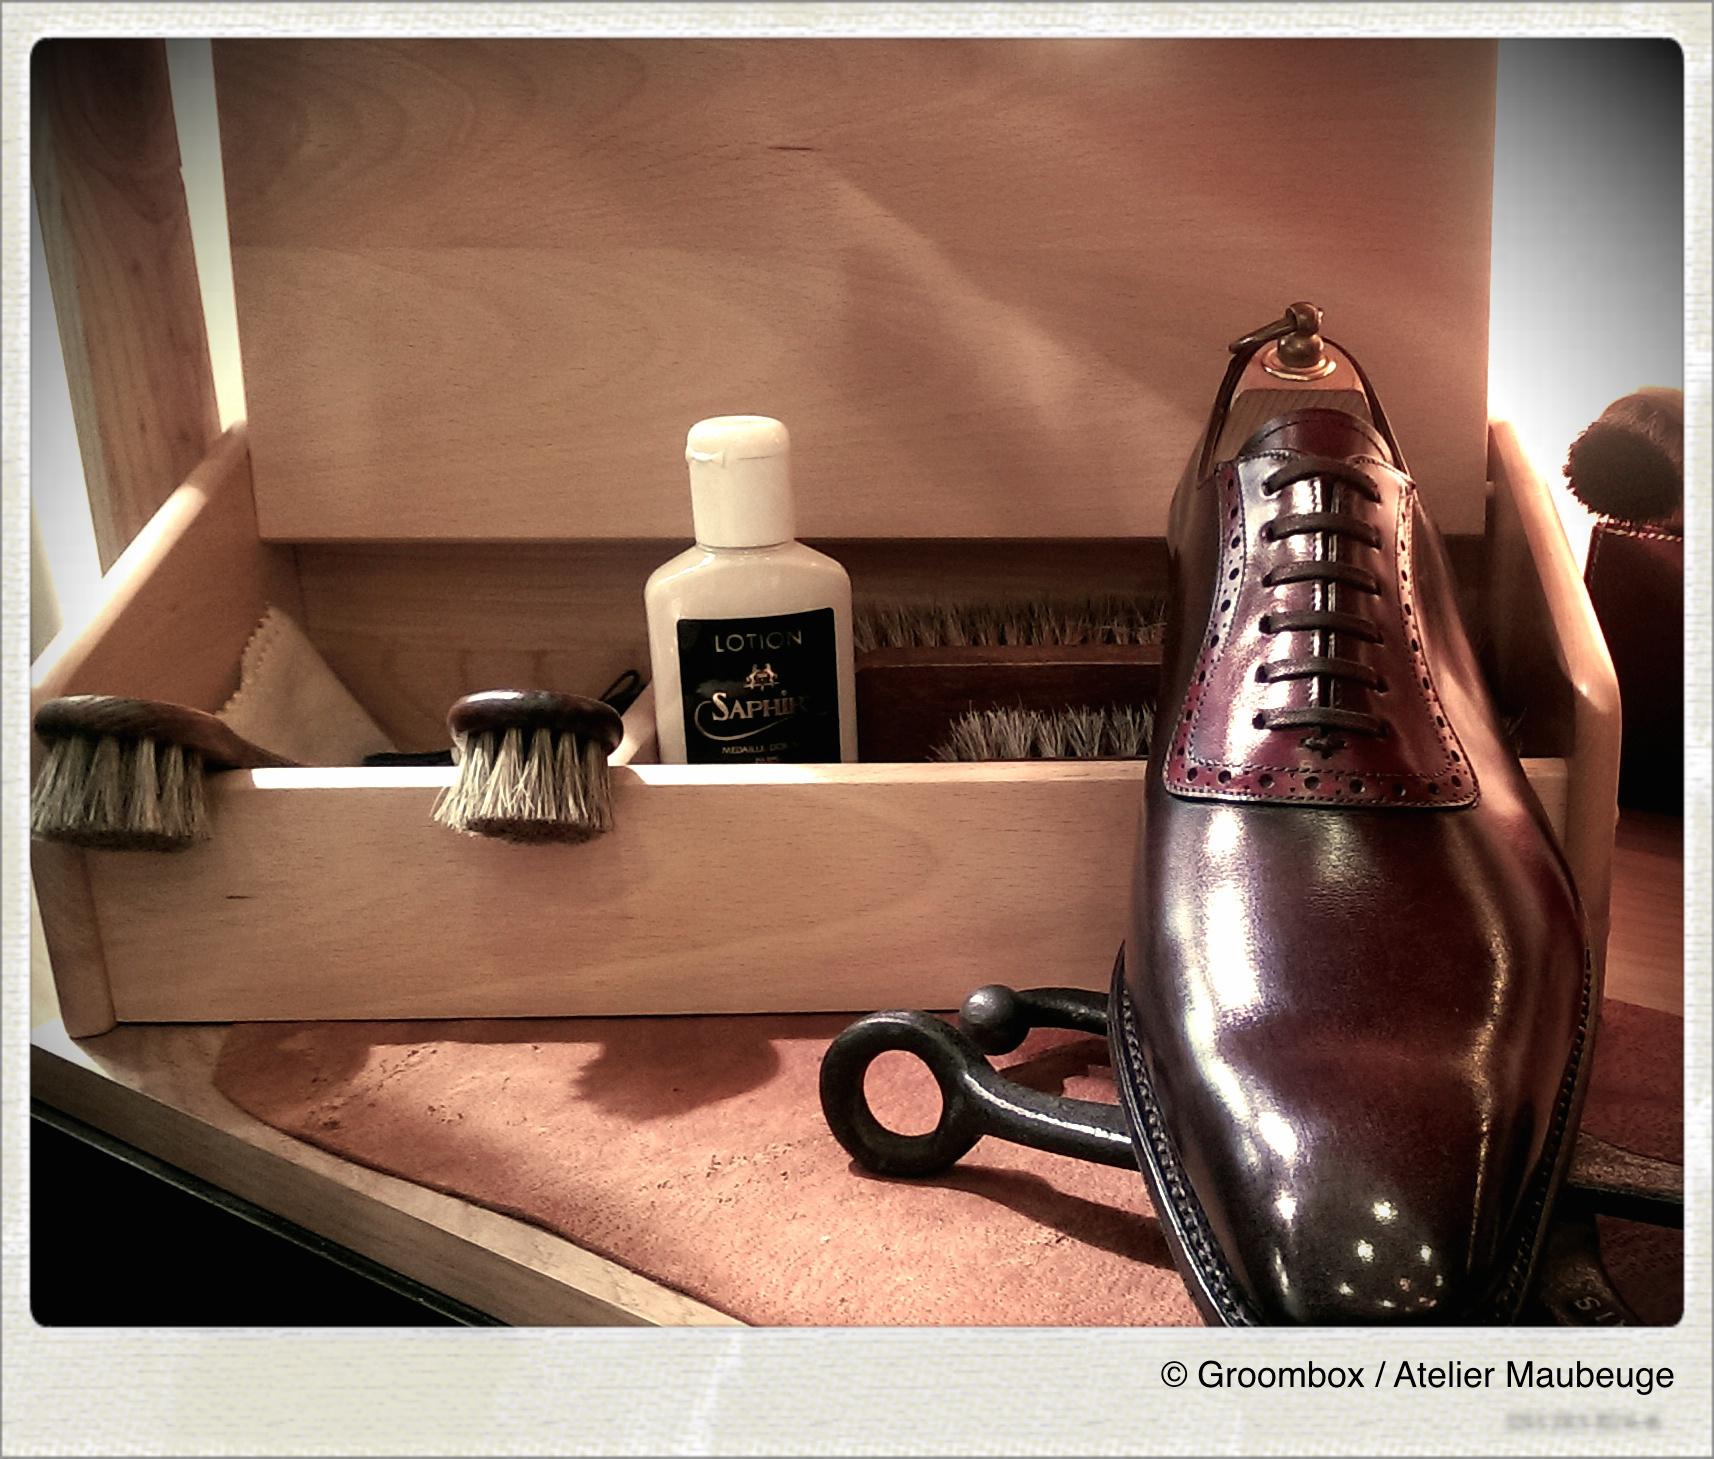 Glaçage - Chaussures - Groom Box - Cordonnerie